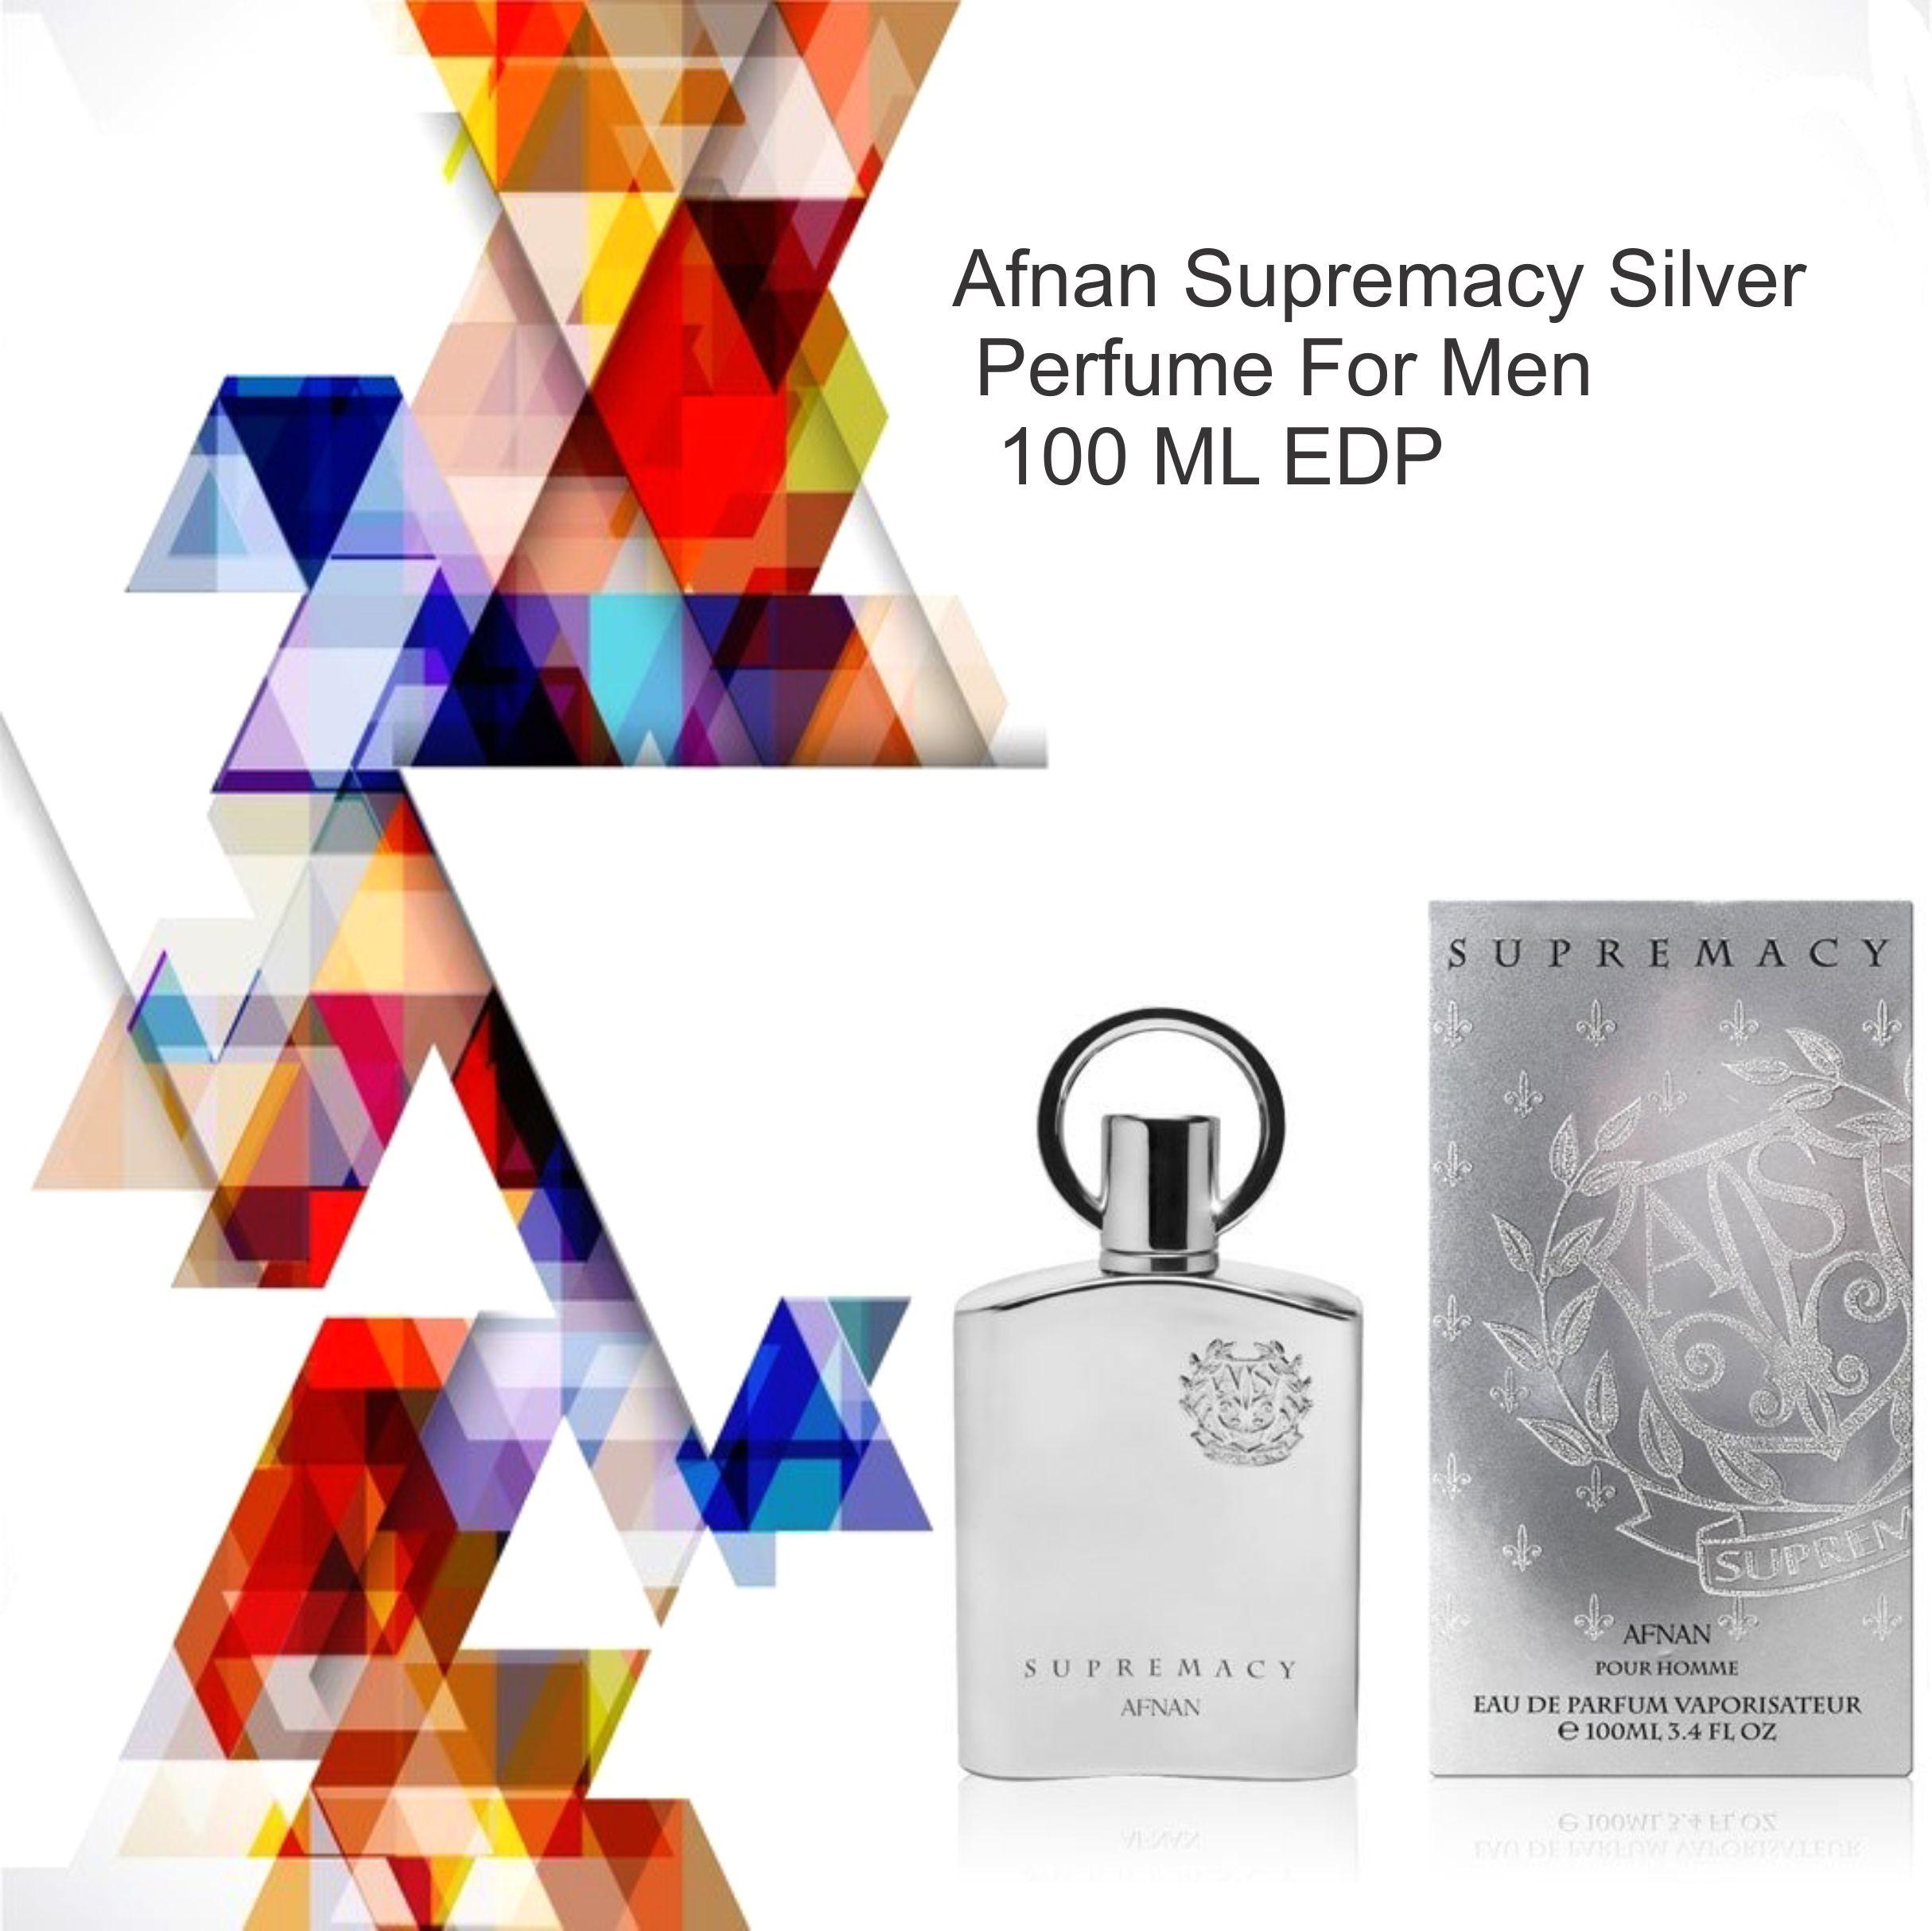 afnan-supremacy-silver-perfume-for-men-100-ml-edp